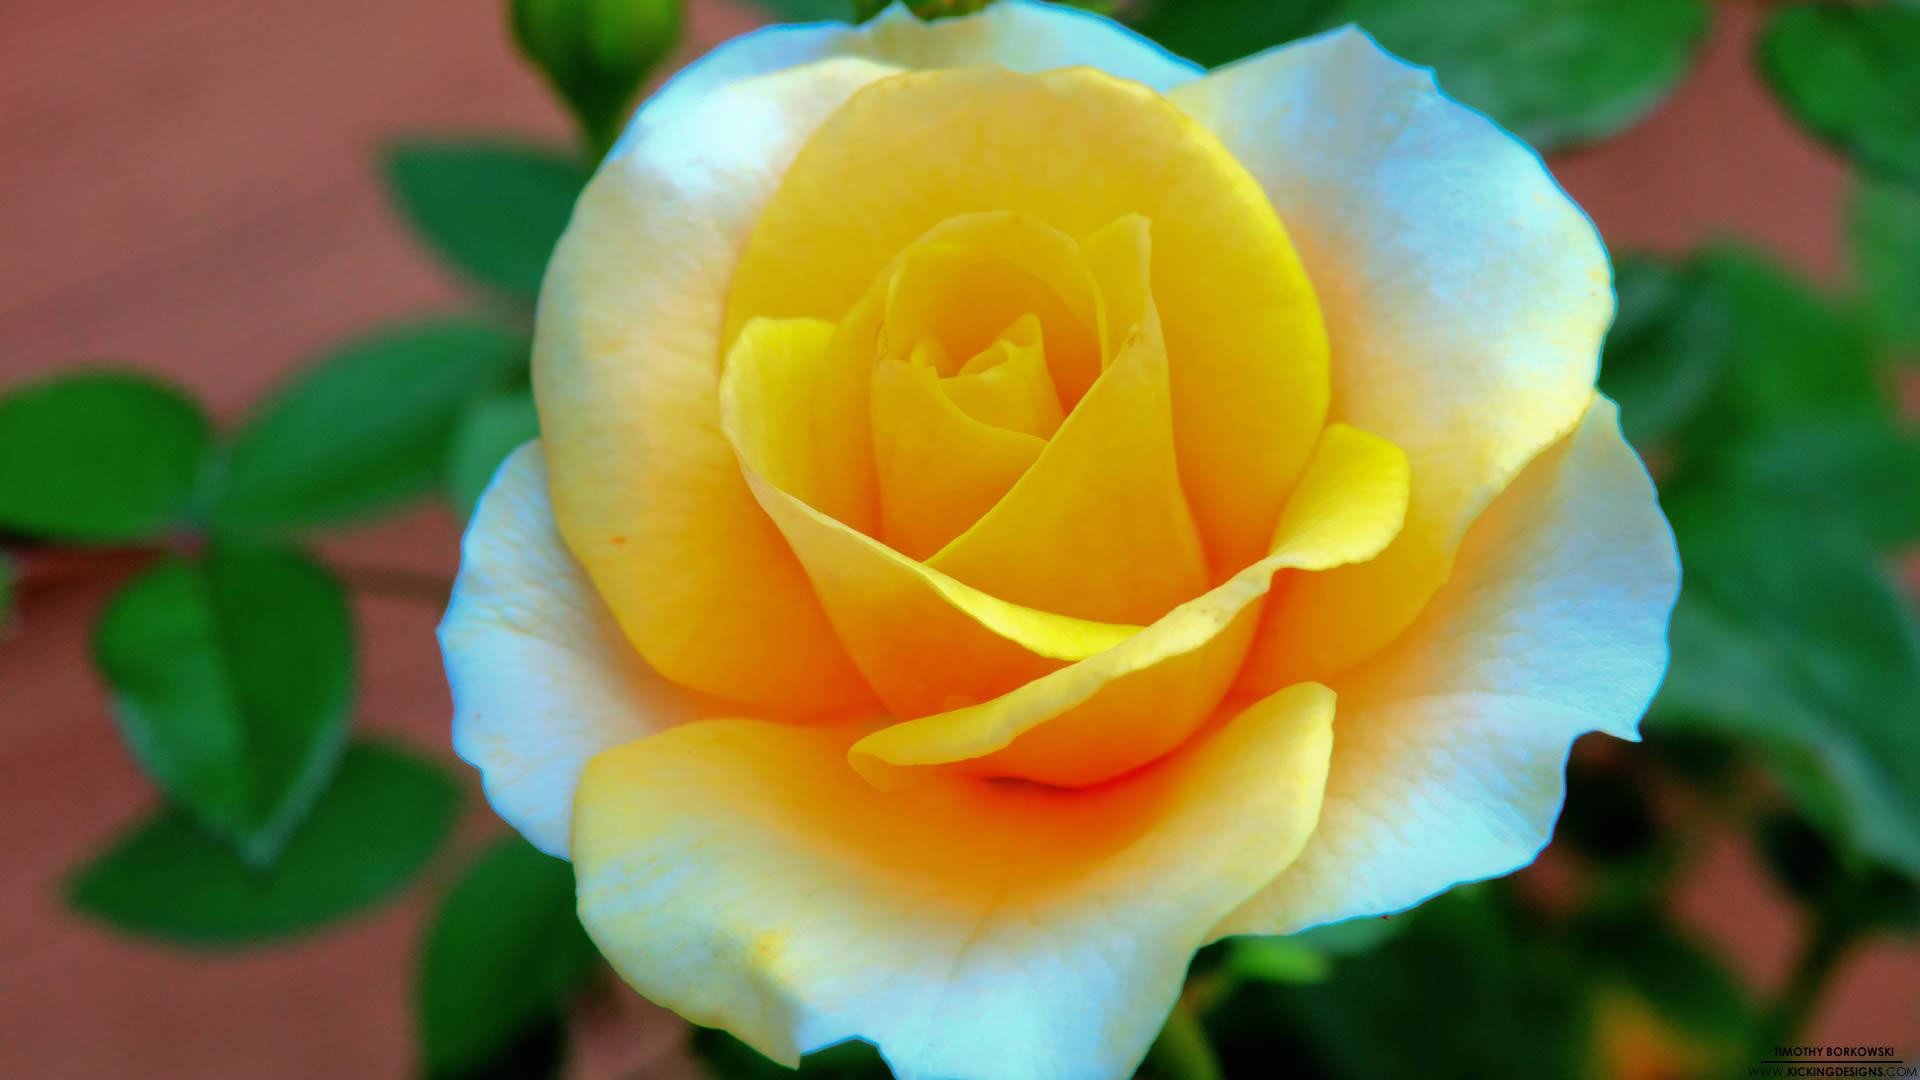 HD Flower Wallpapers 1080p